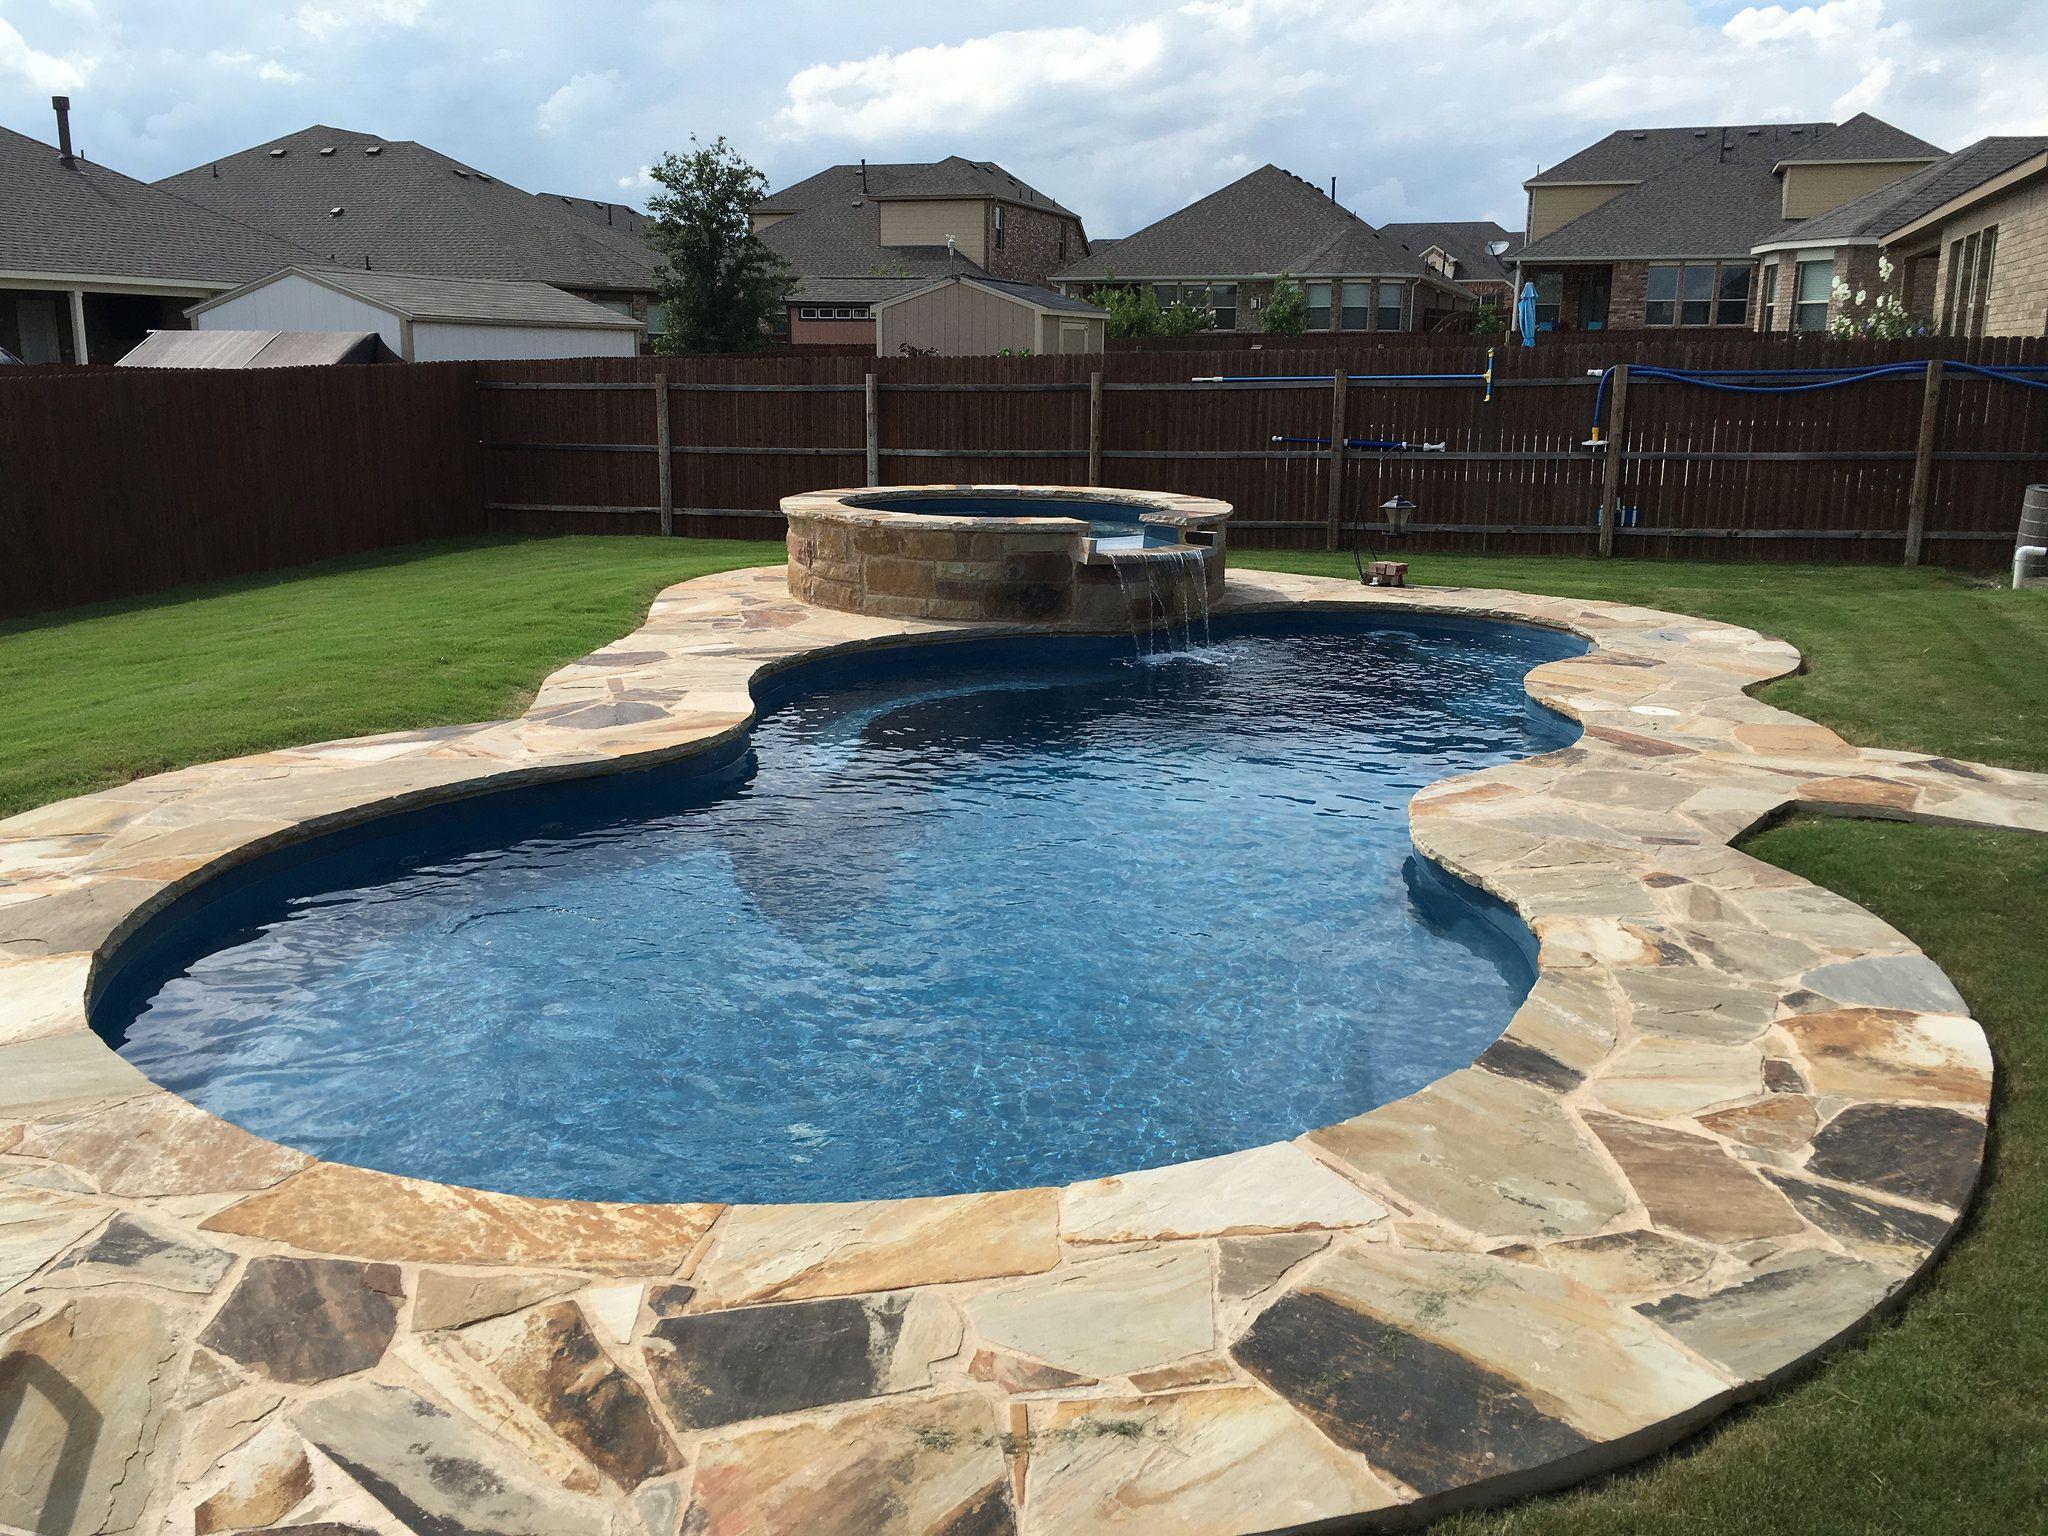 Nebula And Neptune Spa With Custom Swimming Pool Deck Stone Work Aquamarine Pools Of Texas Fibergl Custom Swimming Pool Fiberglass Pools Swimming Pool Decks